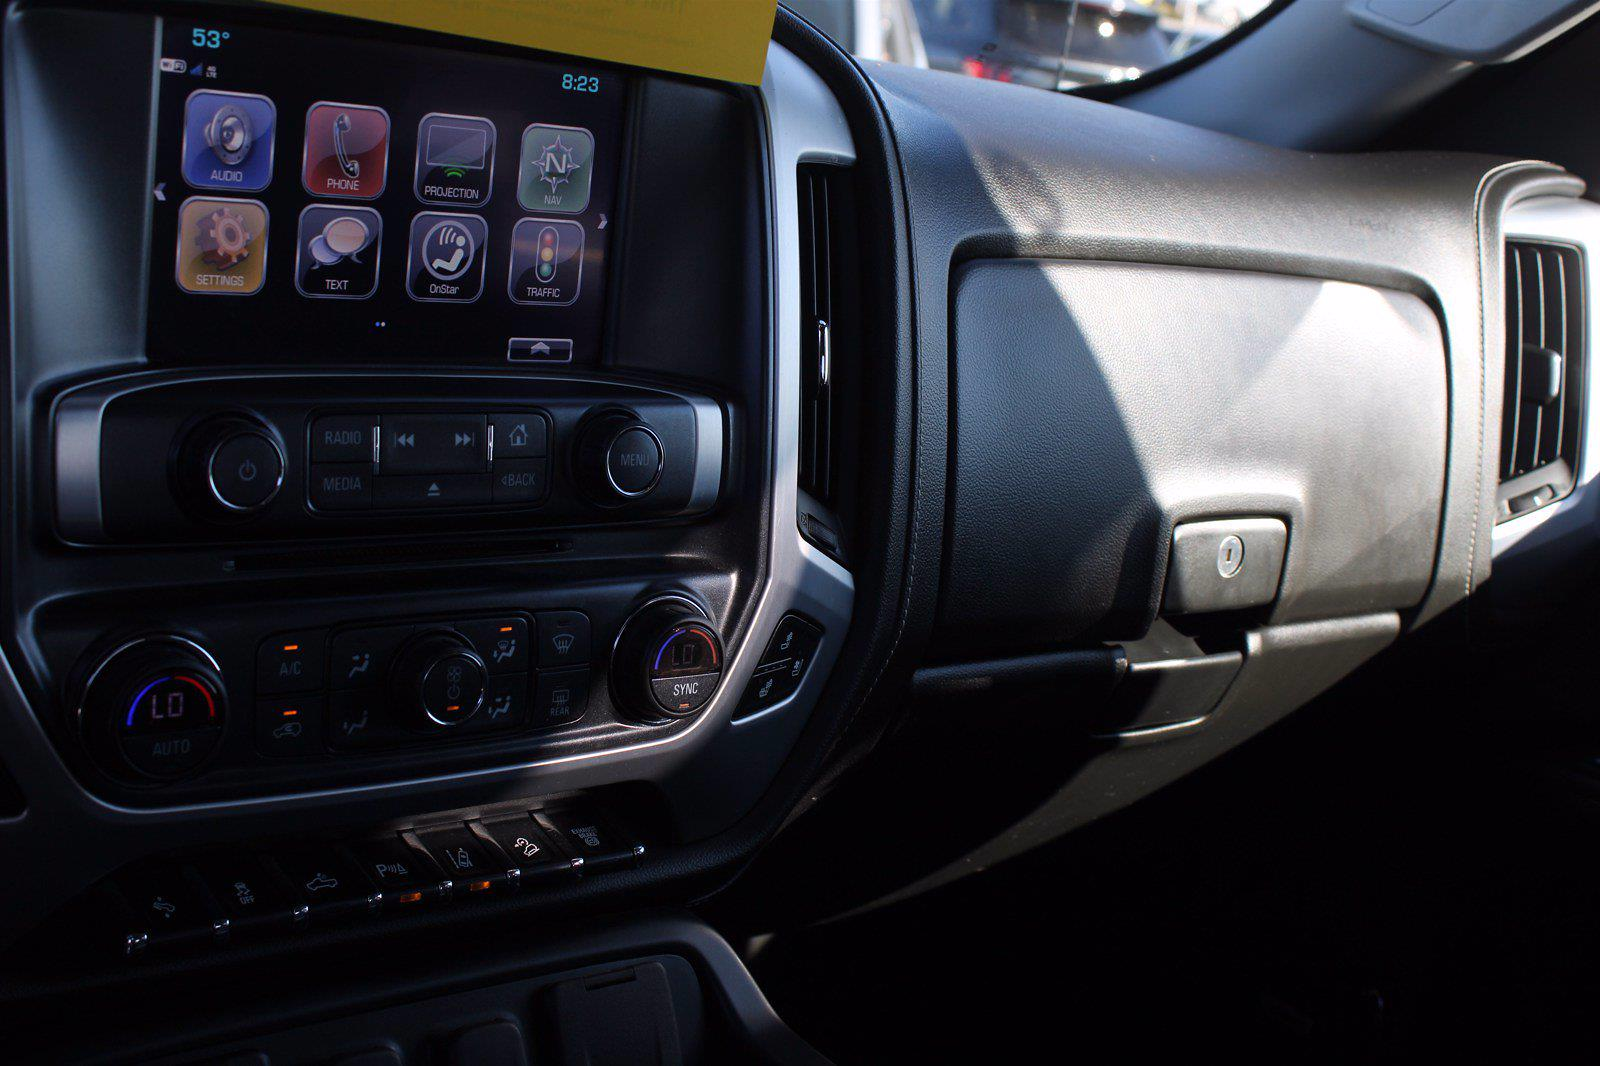 2019 GMC Sierra 3500 Crew Cab 4x4, Pickup #DAG0047 - photo 4